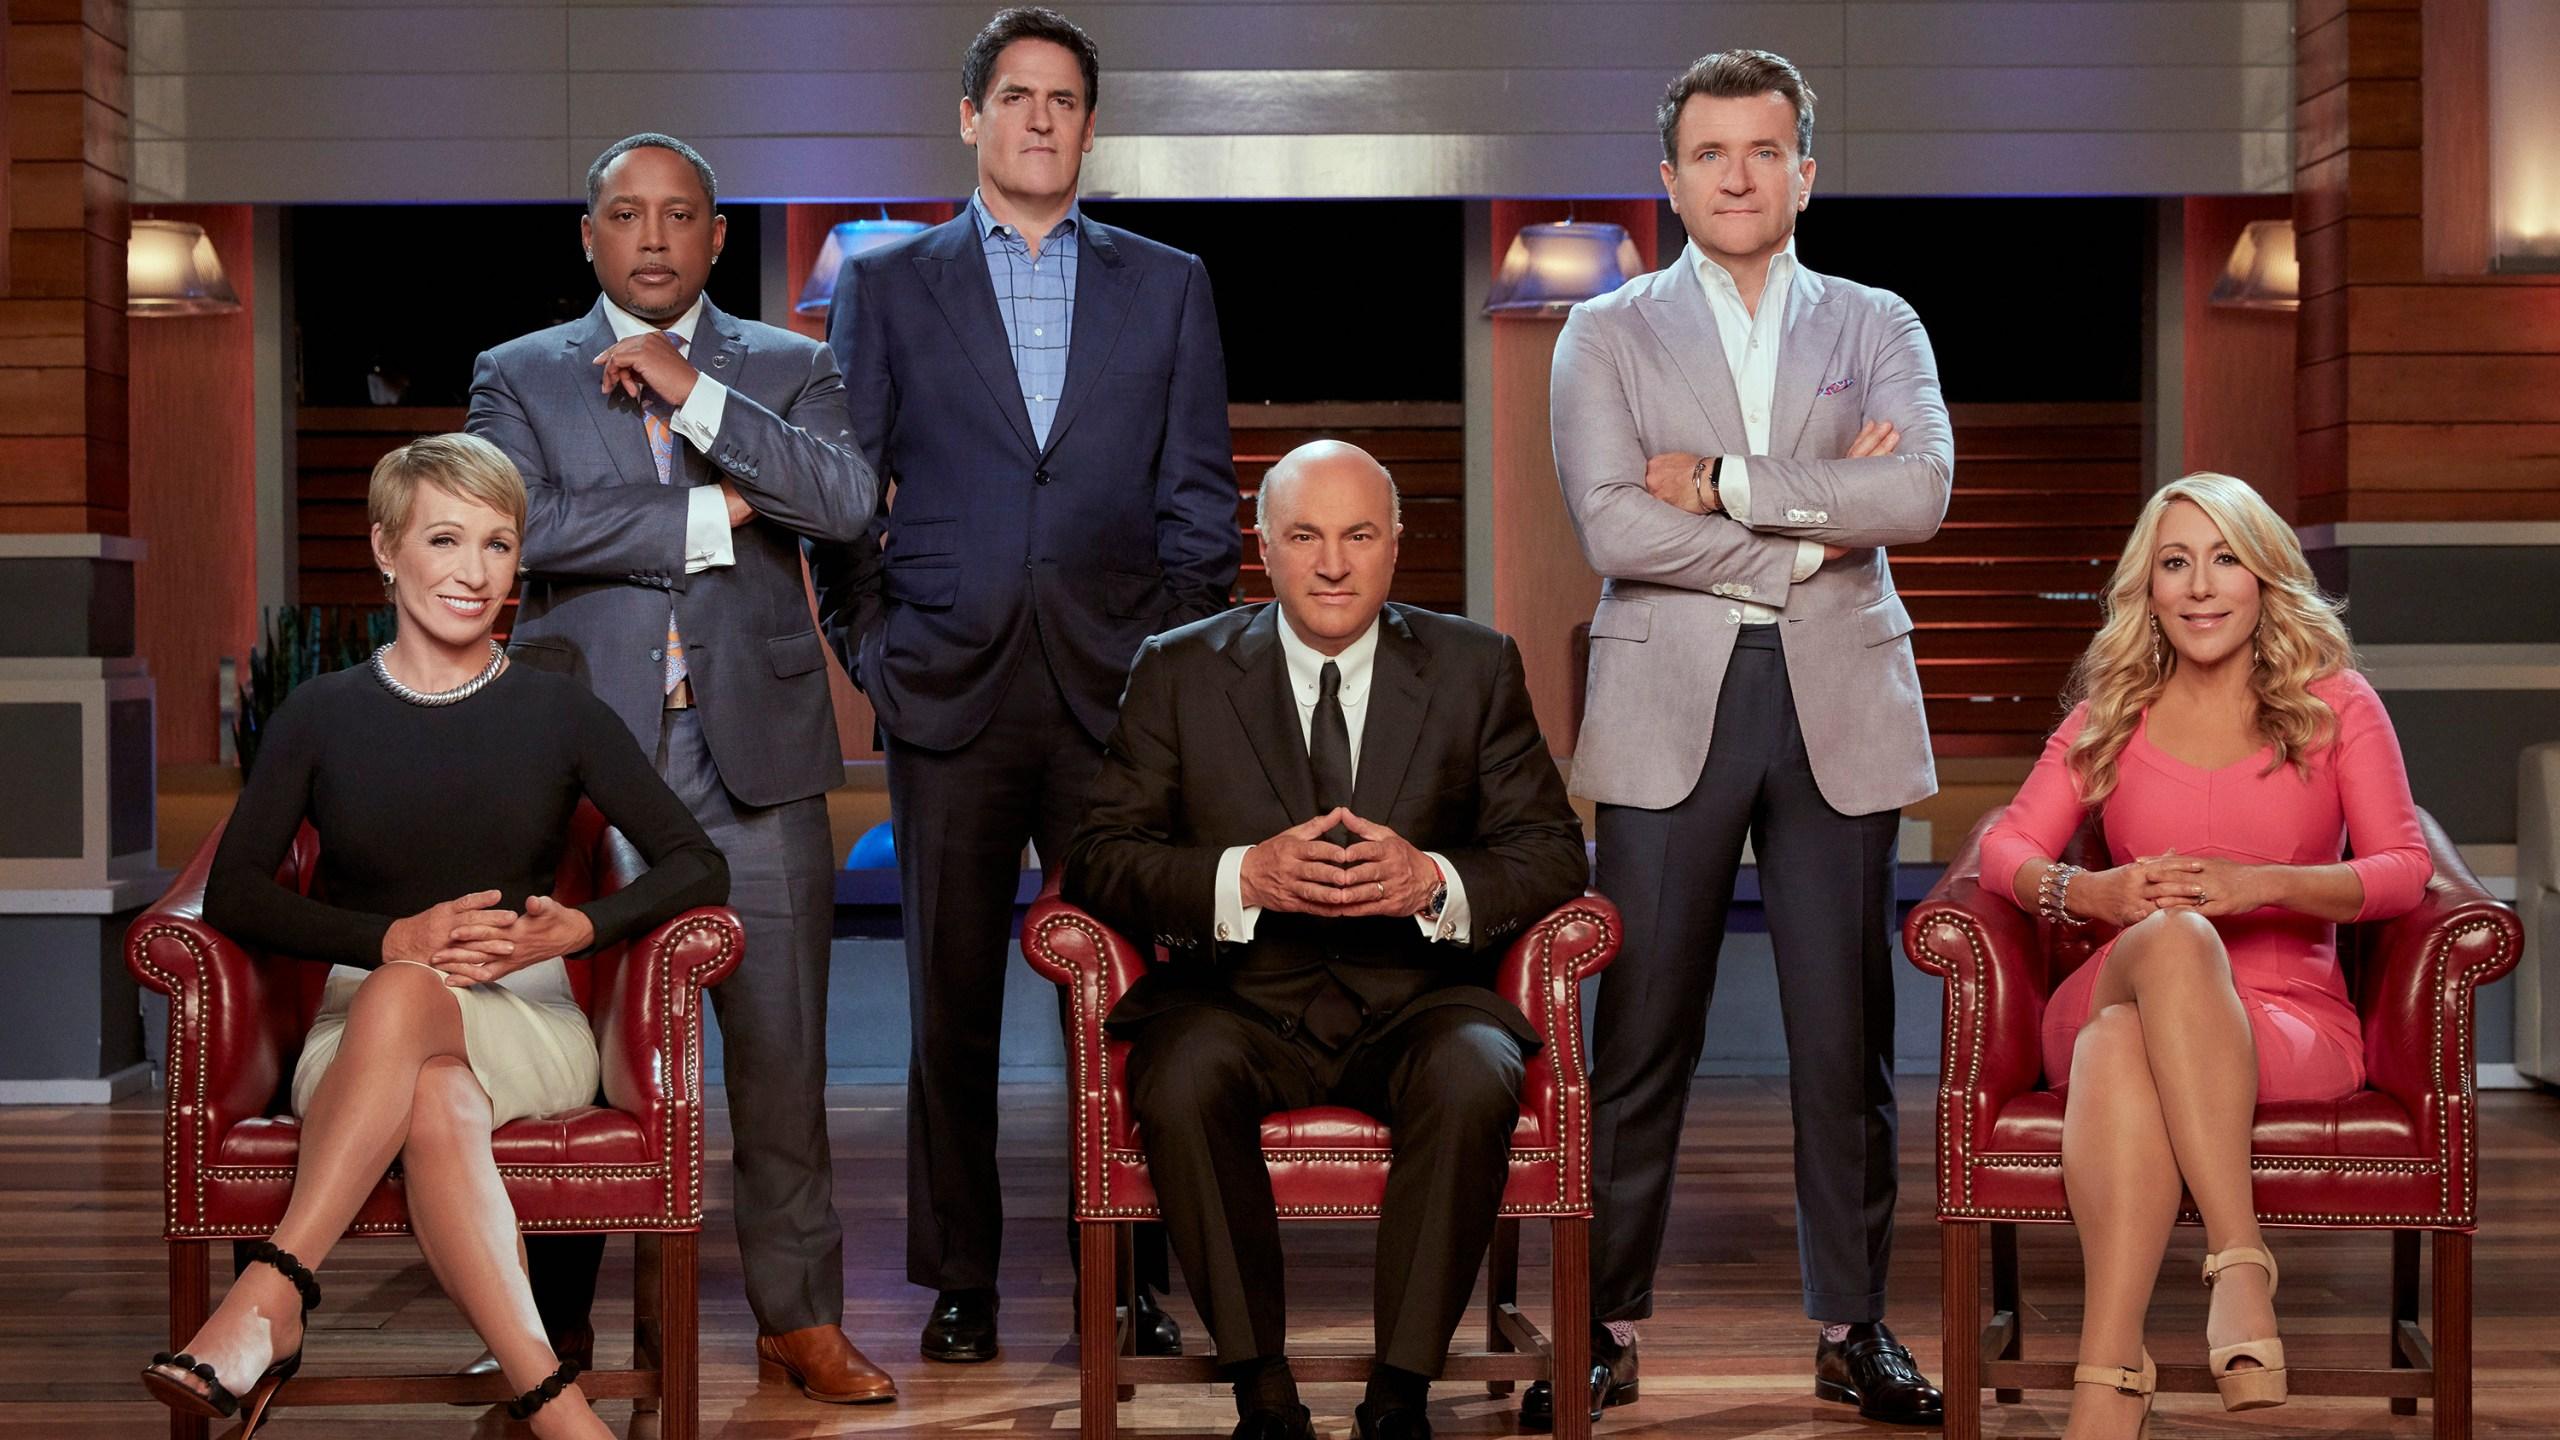 Shark Tank Season 10 Brings New Guest Sharks Including Charles Barkley